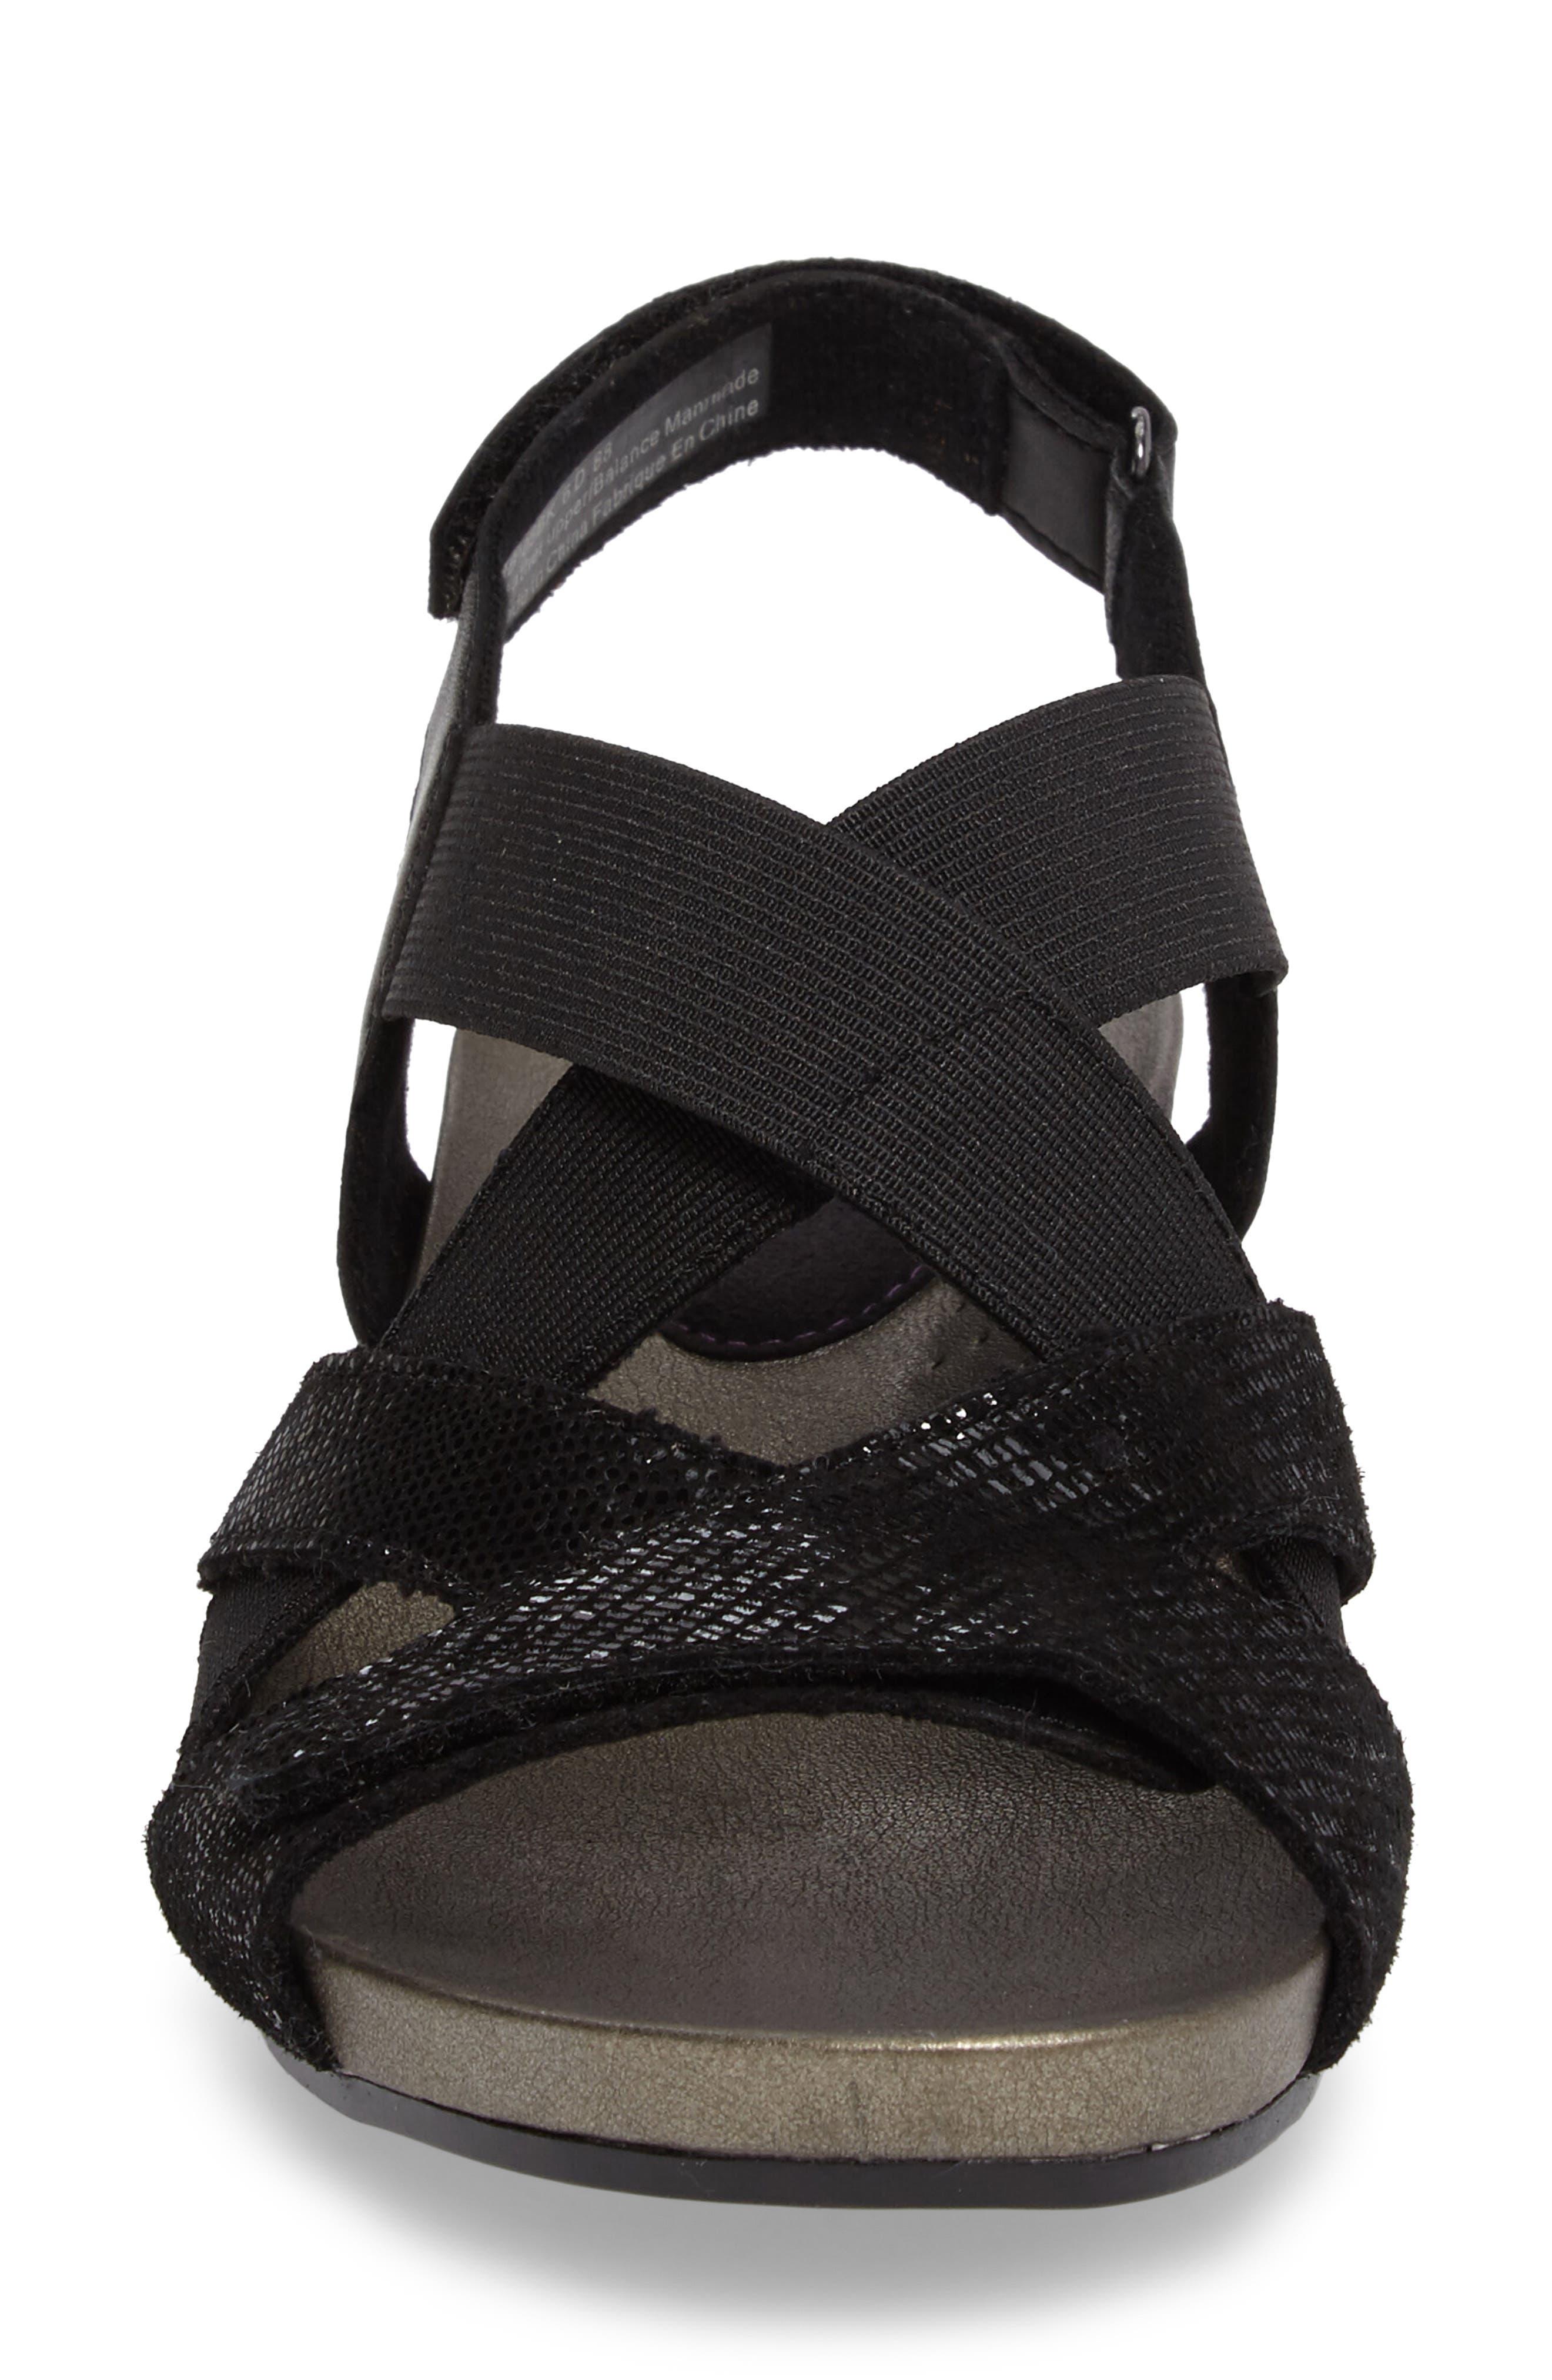 Standon Cross Strap Sandal,                             Alternate thumbnail 4, color,                             001